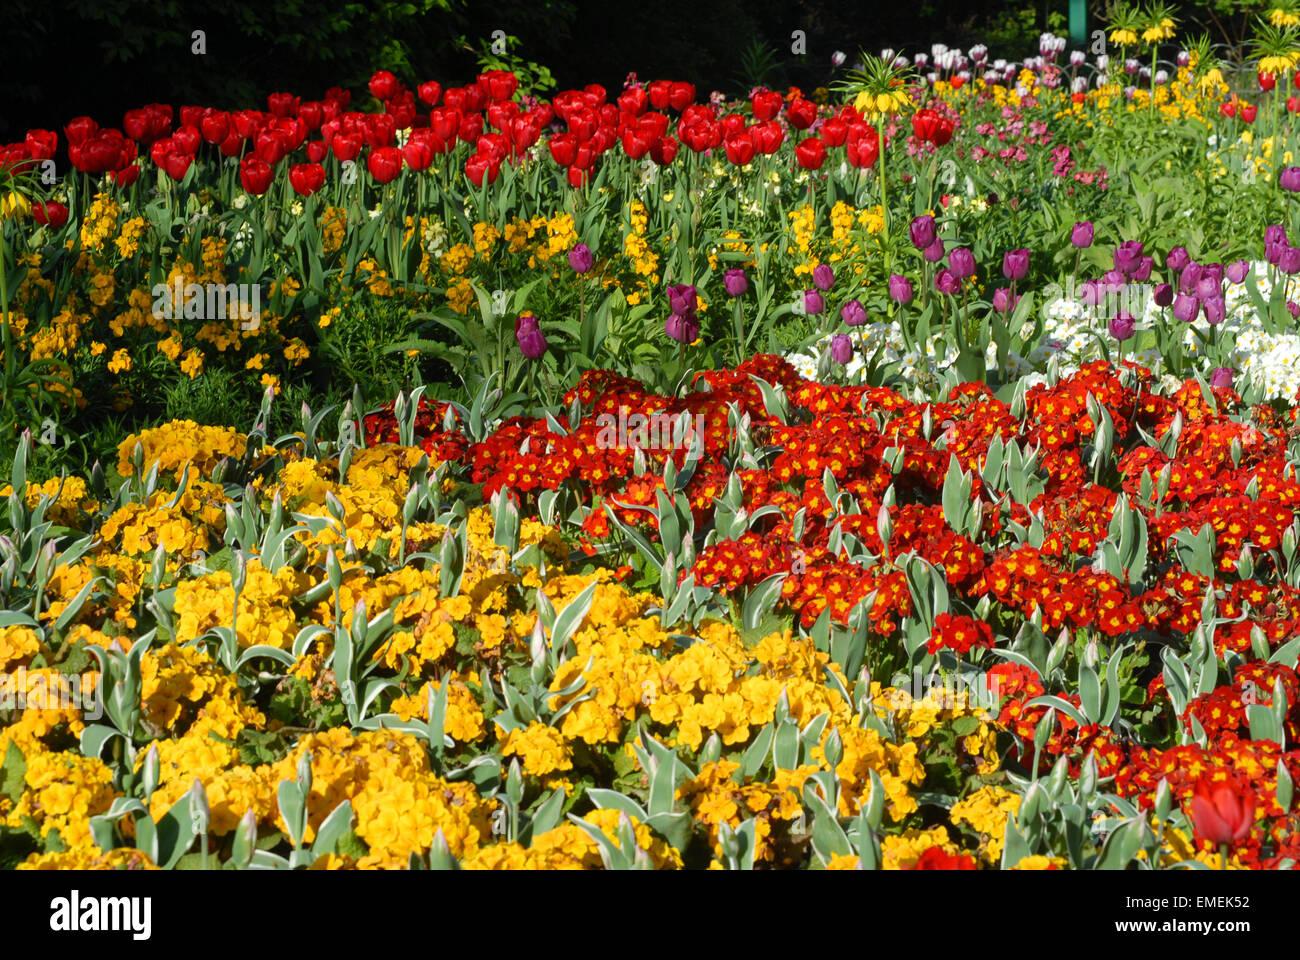 London, UK, 20 April 2015,  Bright April sunshine brings to life the vibrant colours of the flowers on St James Stock Photo